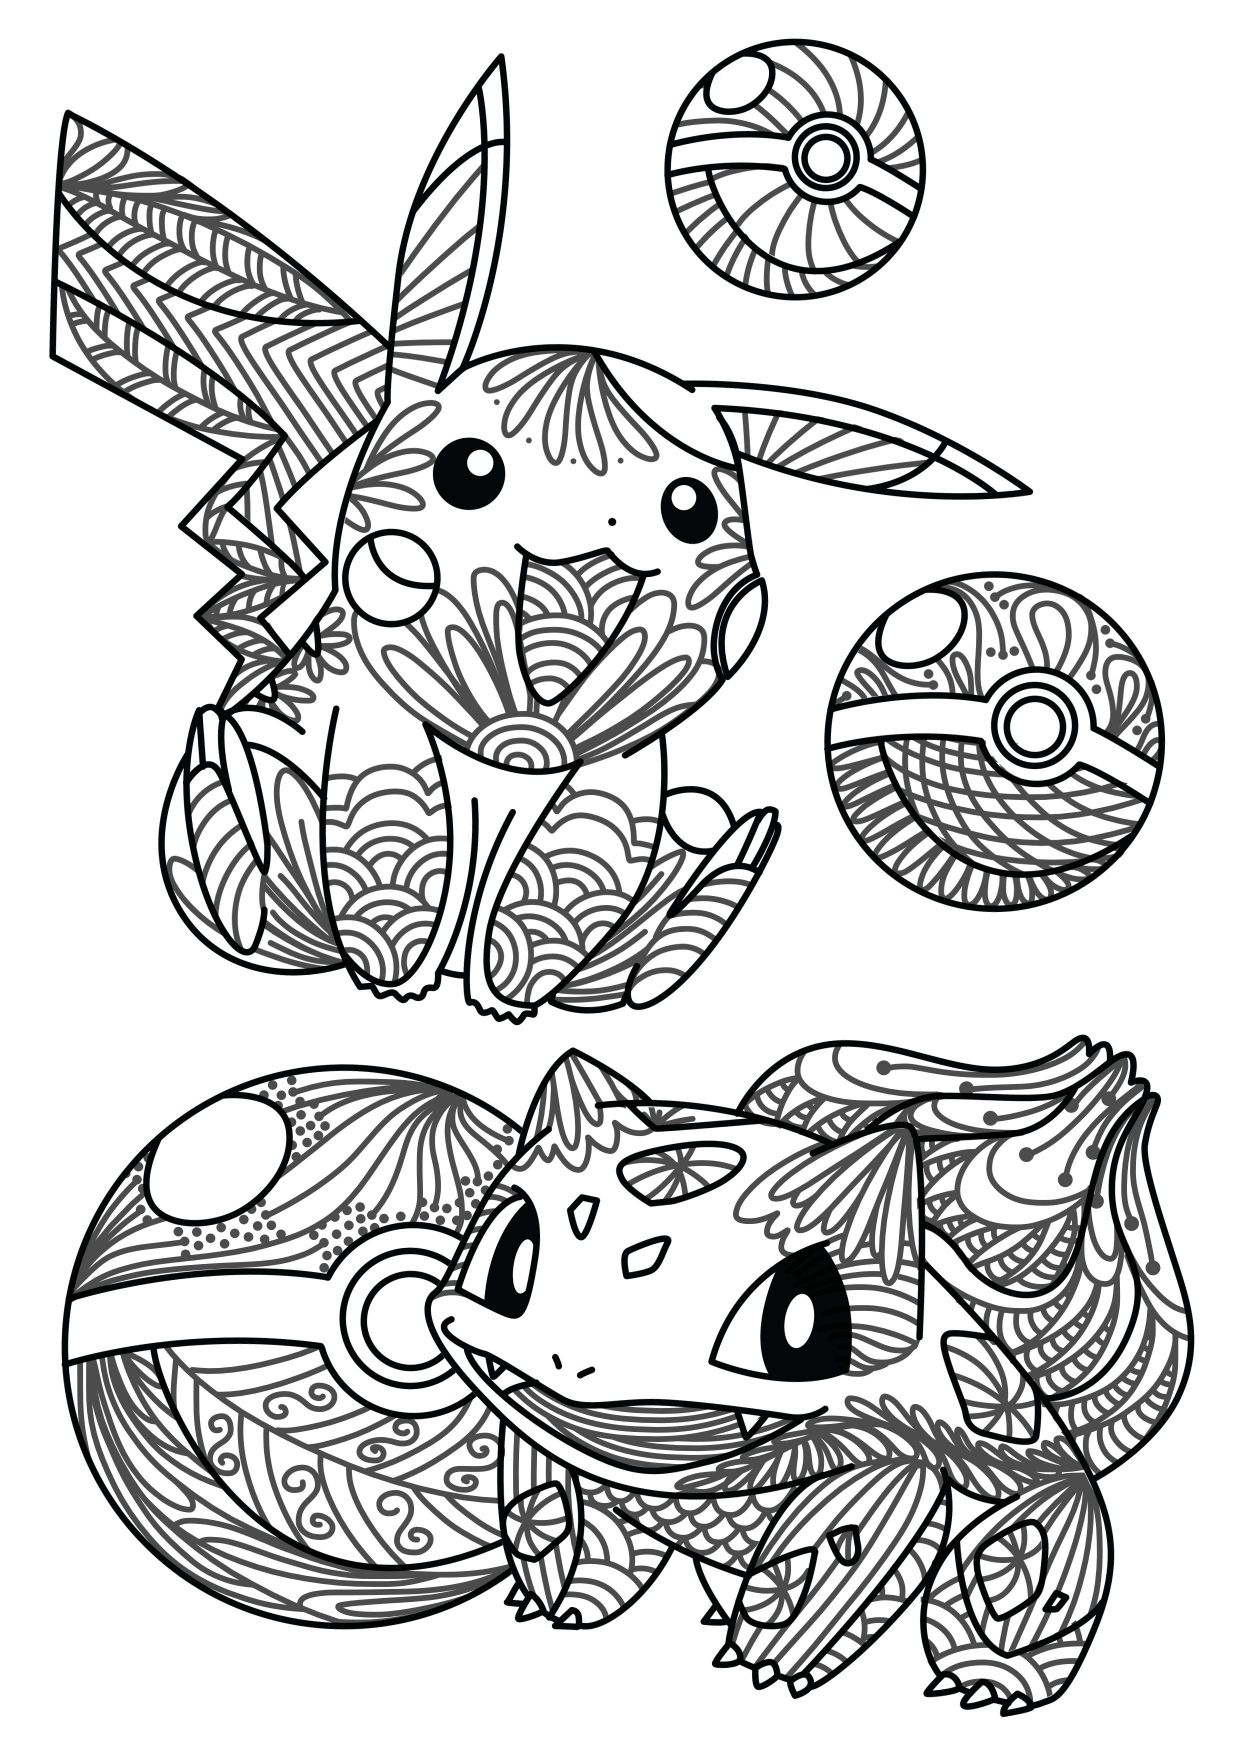 1240x1754 Shocking You Caught It Pokemon Adult Coloring Sheet U Craft Gossip